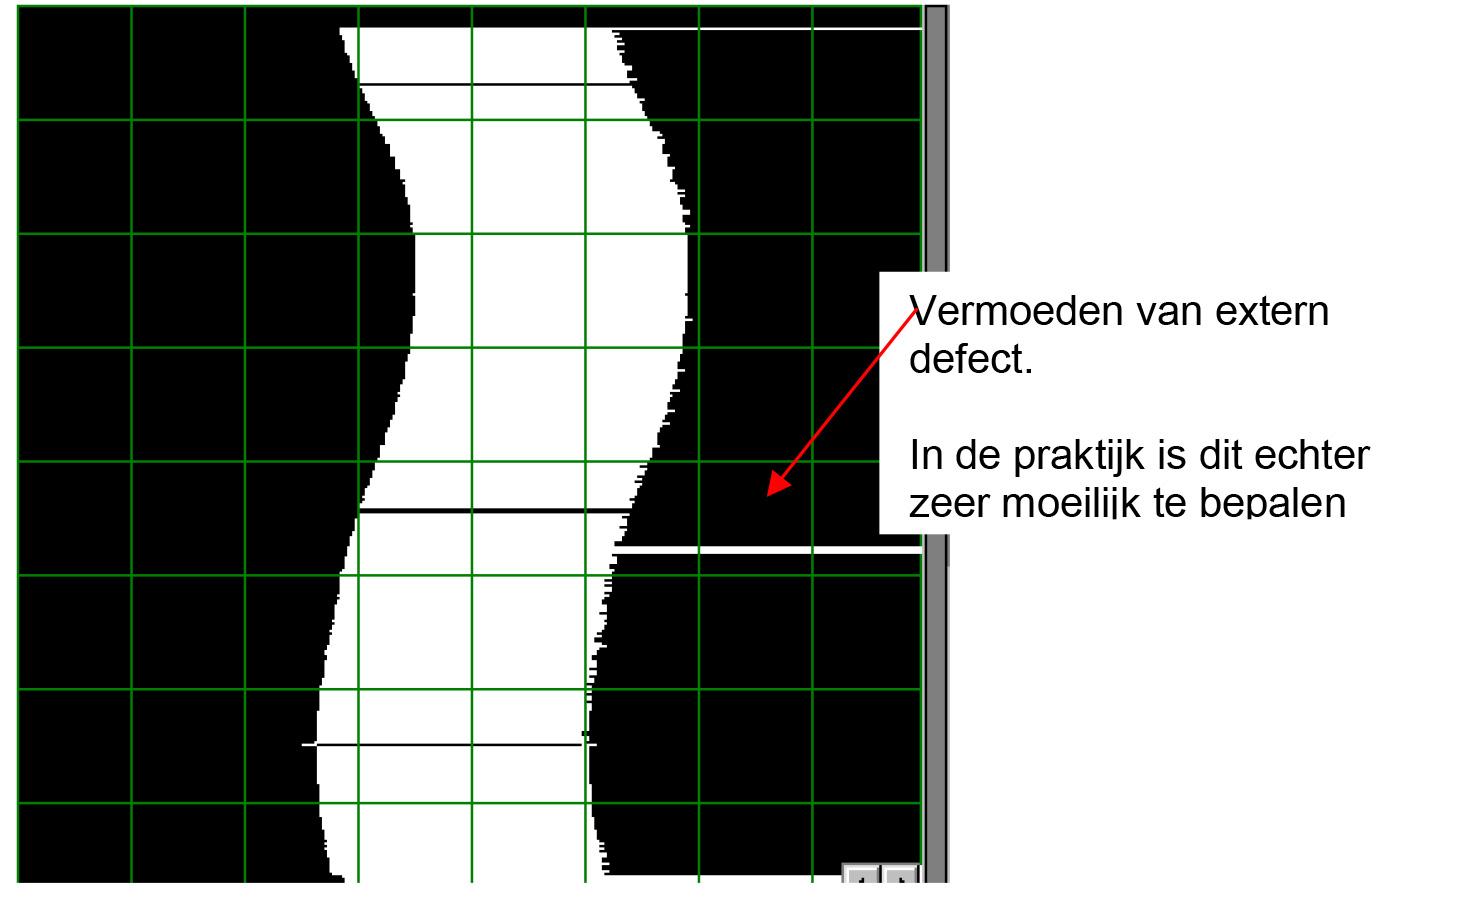 IVT inspections - IRIS - focuspunt defect